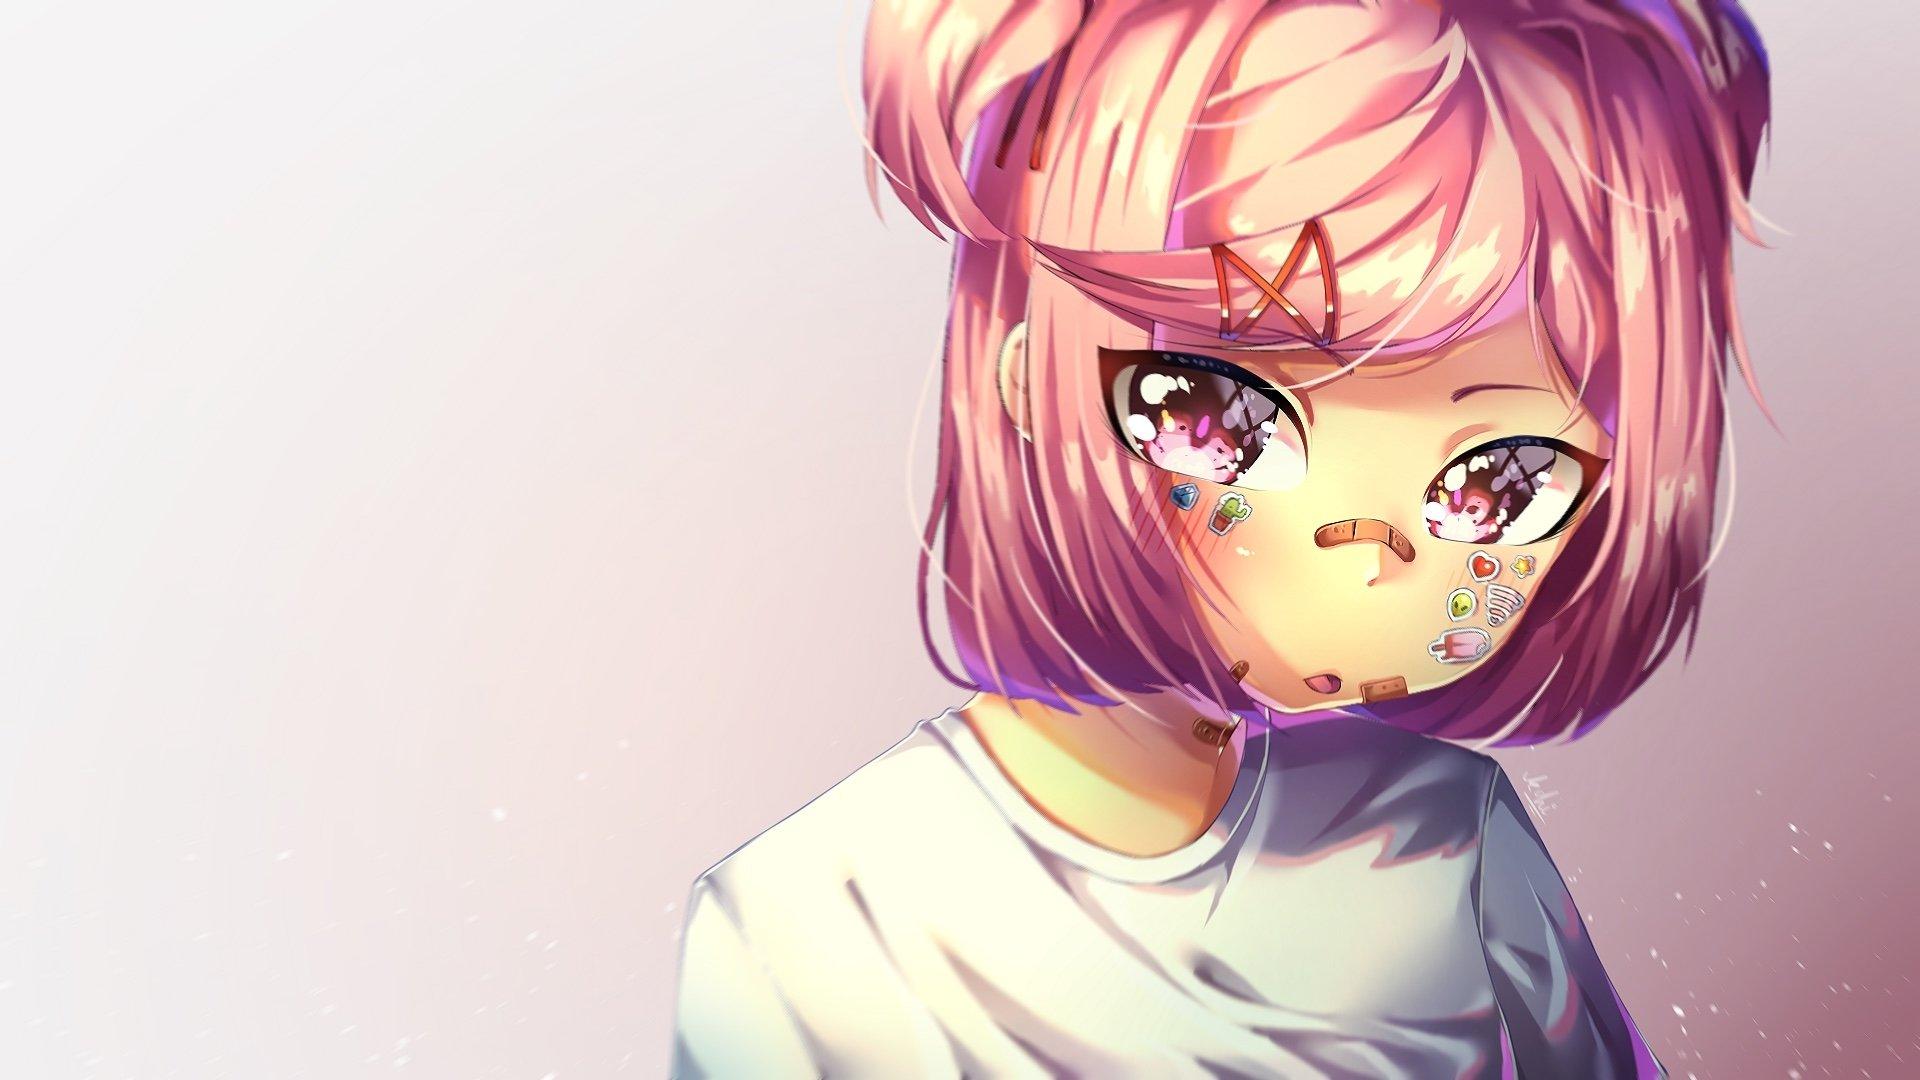 Doki Doki Literature Club Hd Wallpaper Background Image